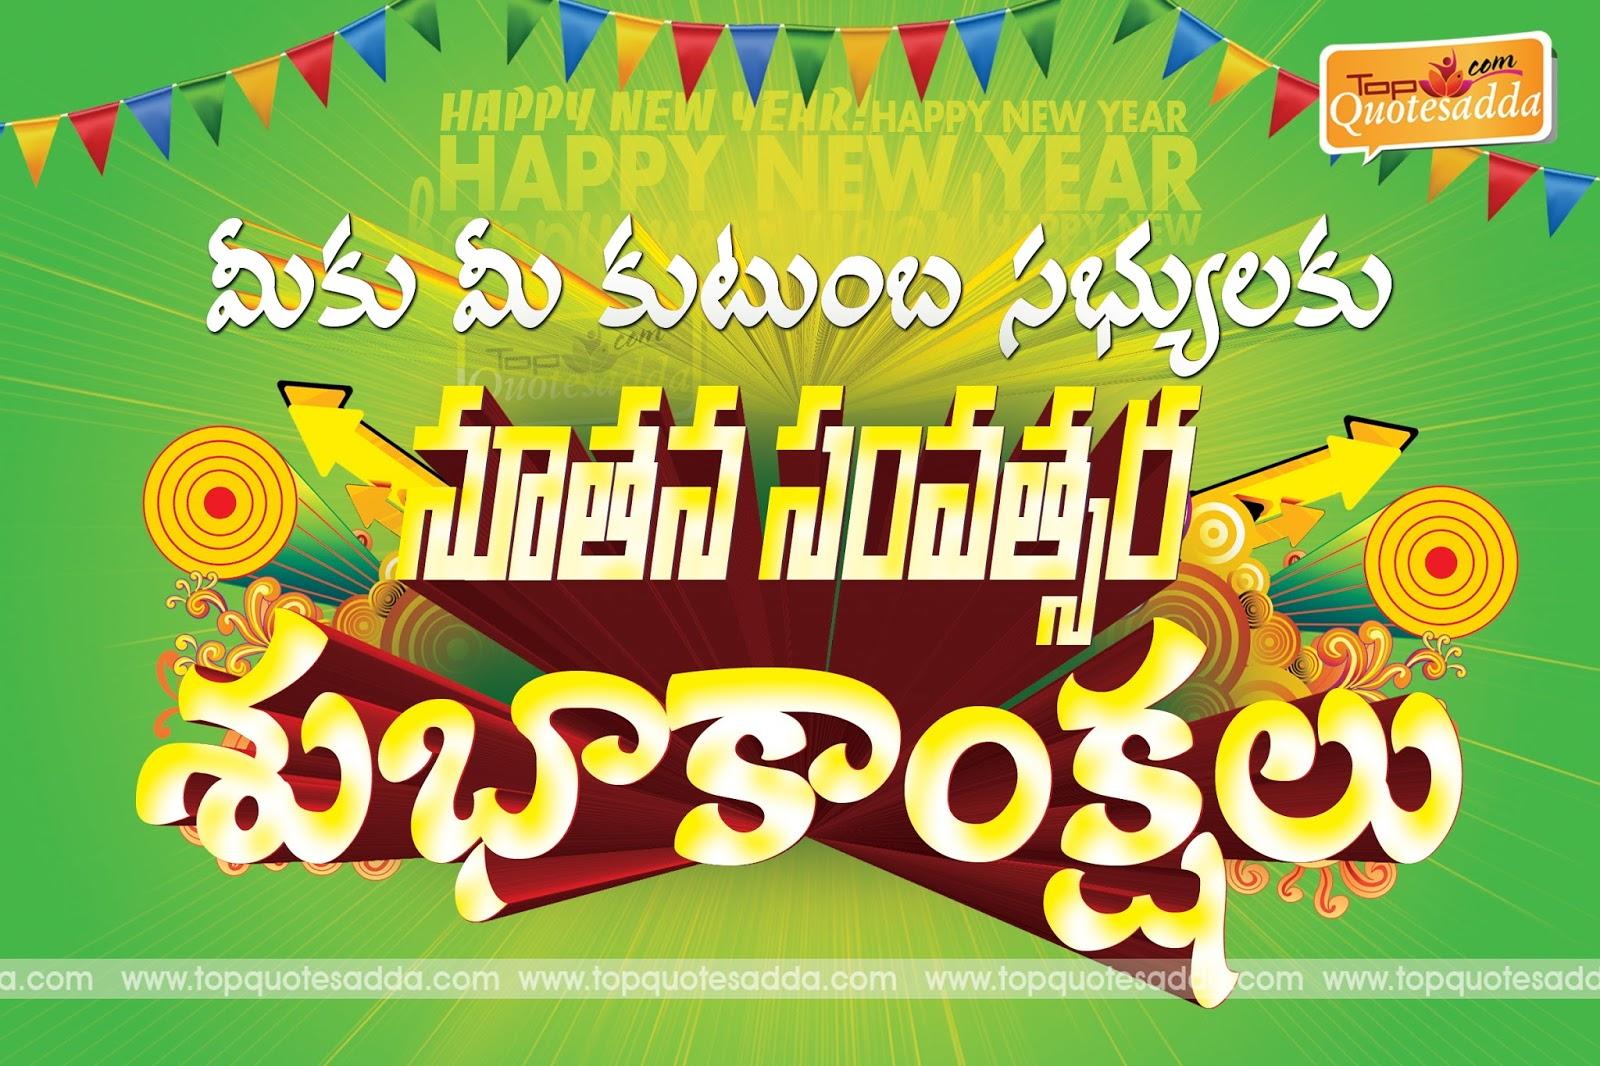 Happy New Year 3d Telugu Quotes And Greetings Topquotesadda